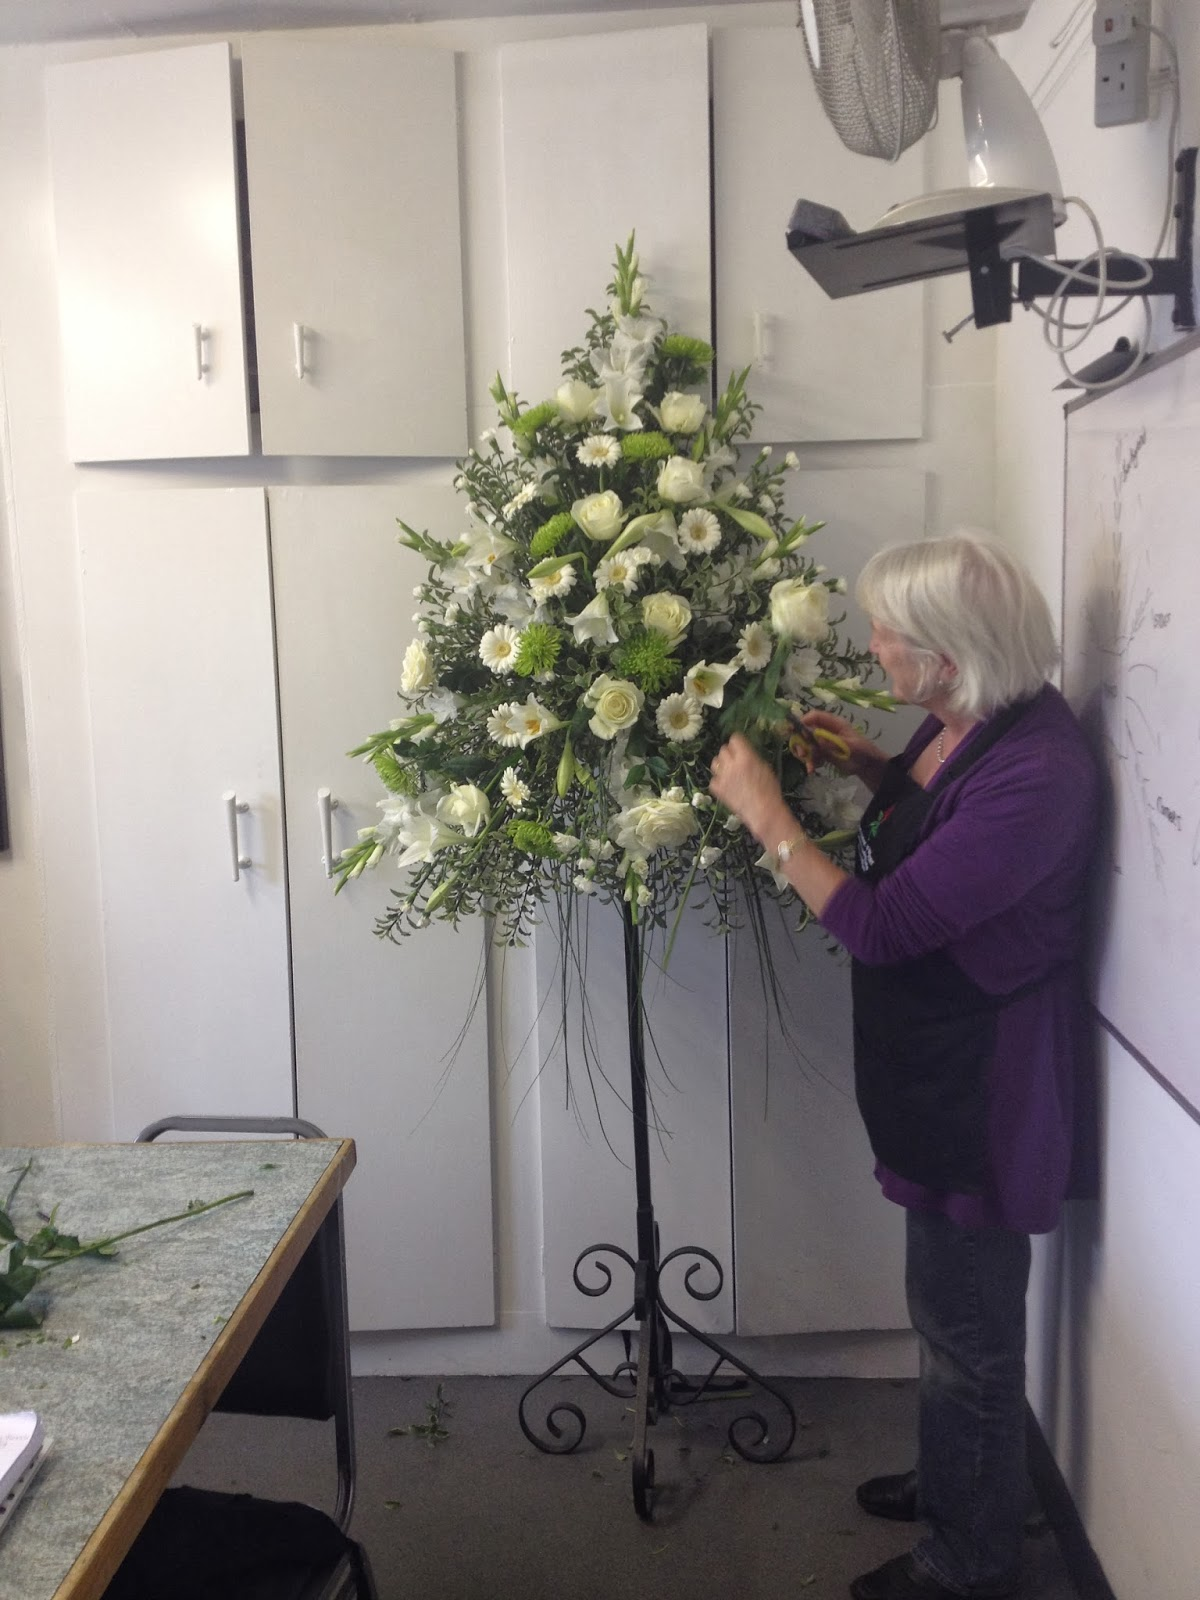 Kays flower school brooch bouquet training advanced bridal making a topiary tree arrangement izmirmasajfo Images